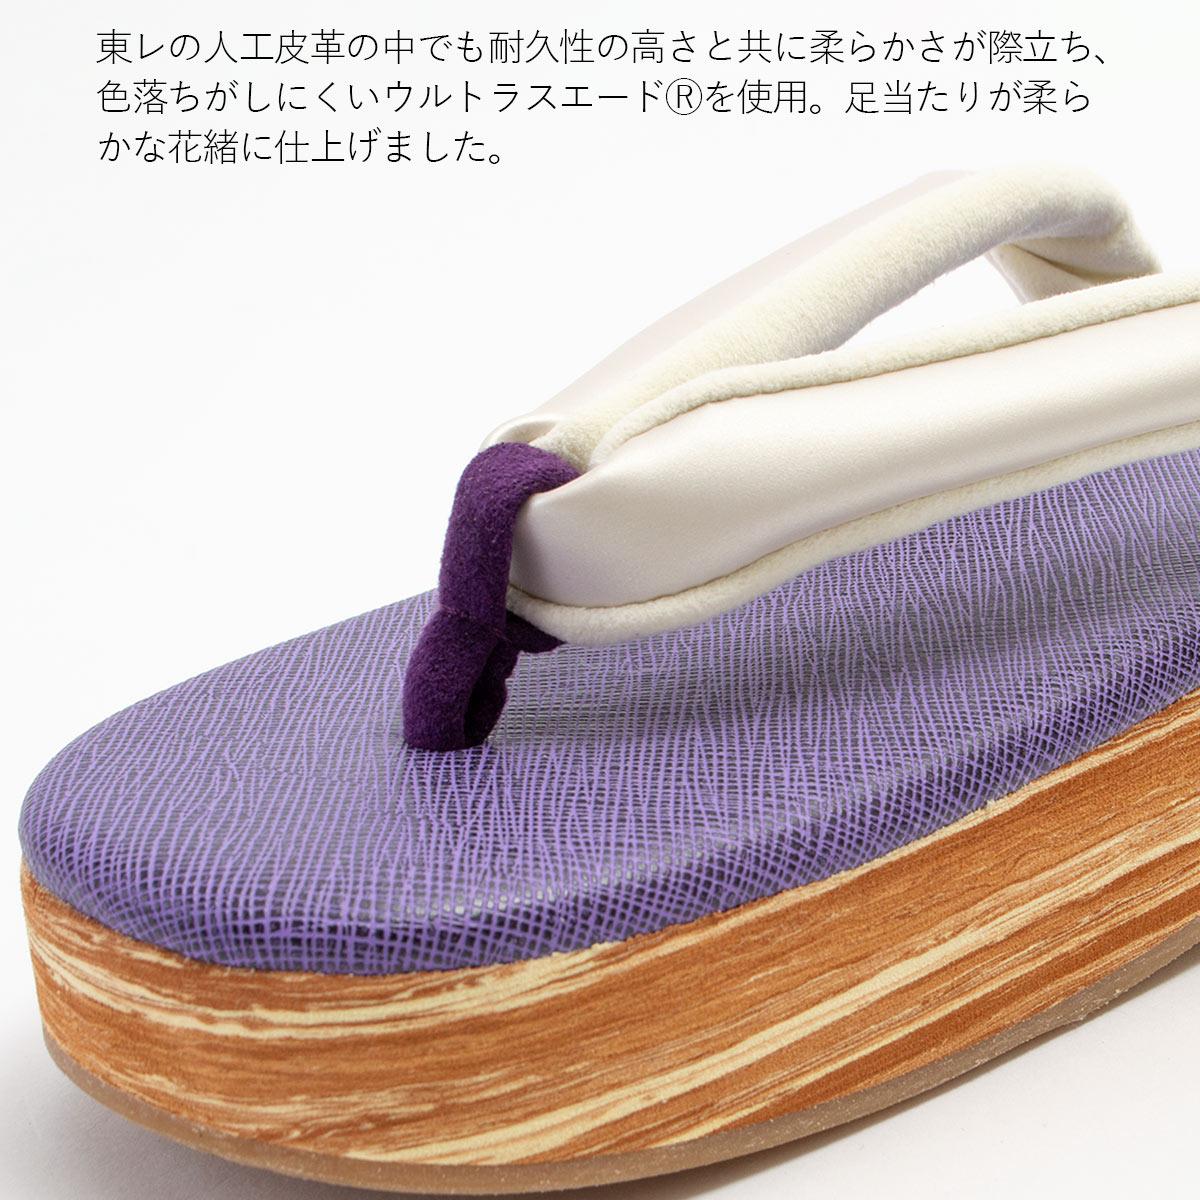 . HAKU 草履 NO.103 |パープル×ホワイト